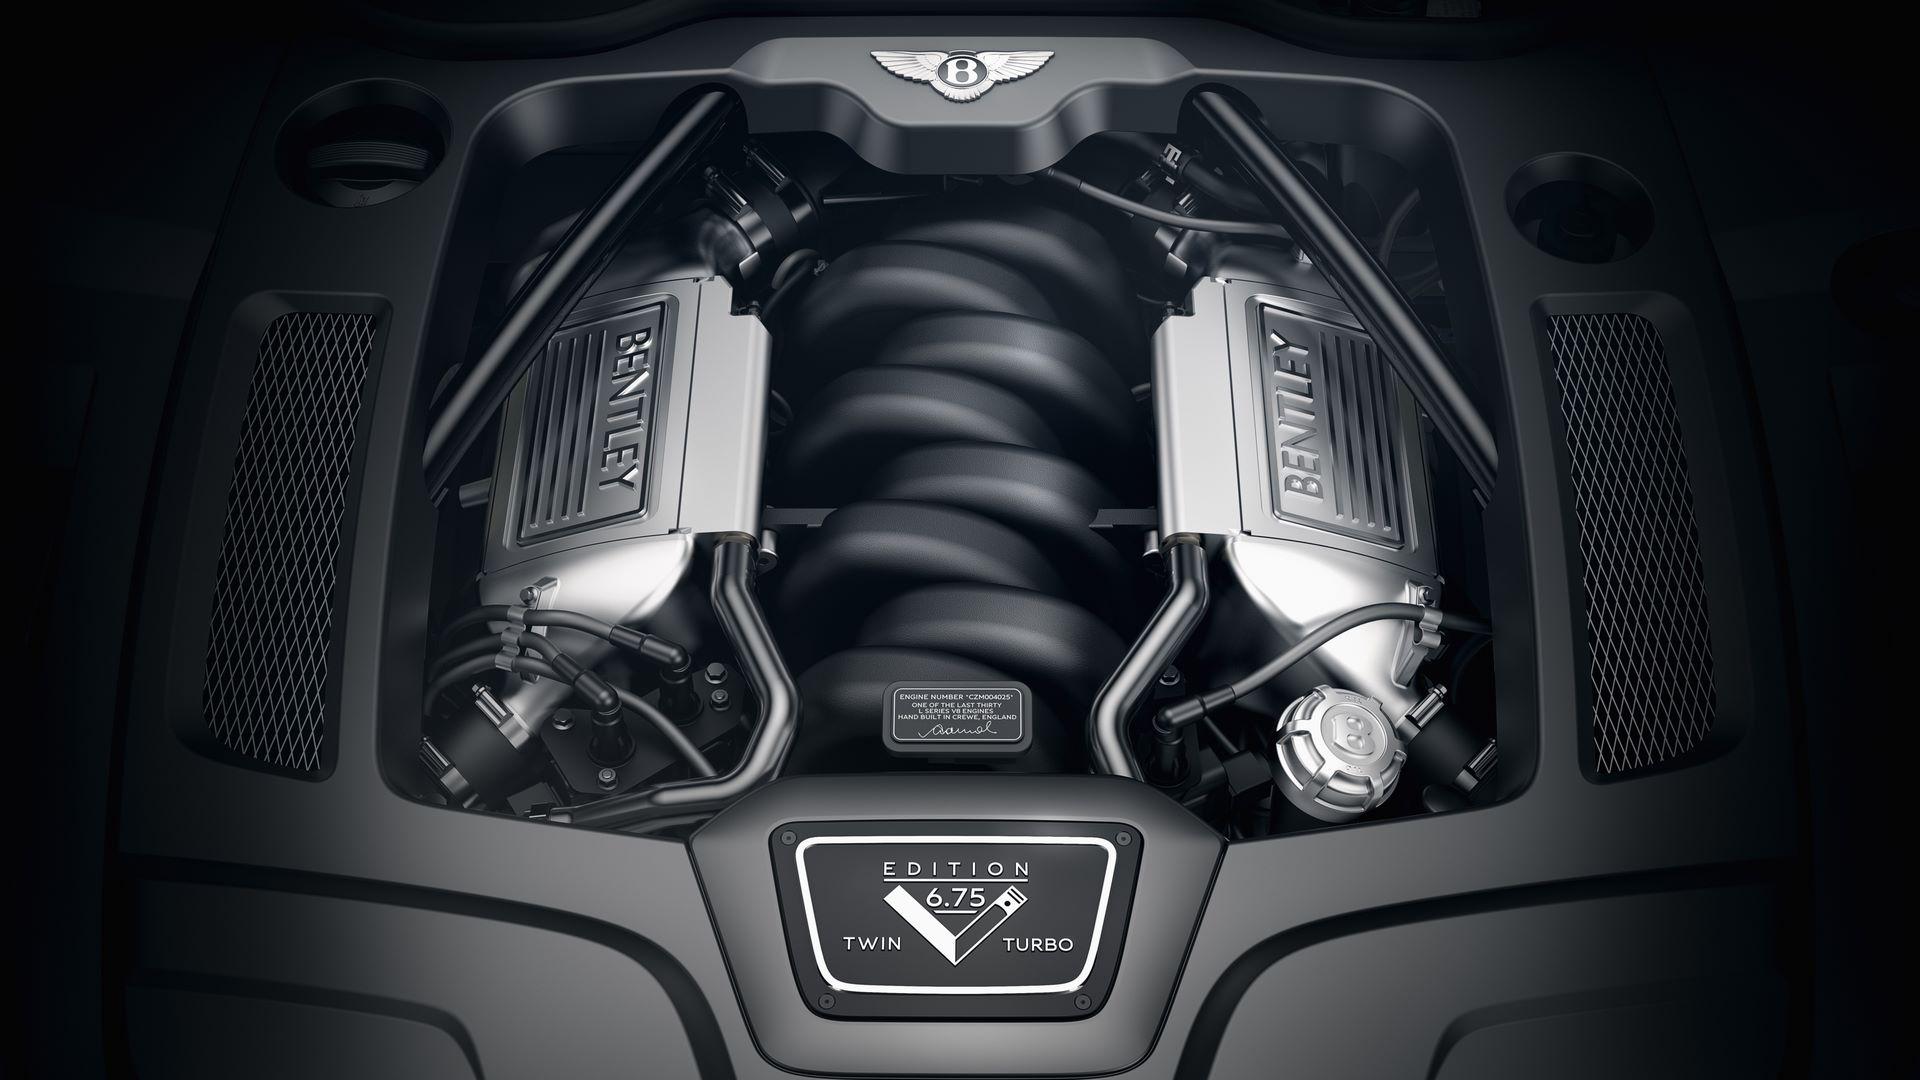 Bentley-Mulsanne-6.75-Edition-By-Mulliner-8